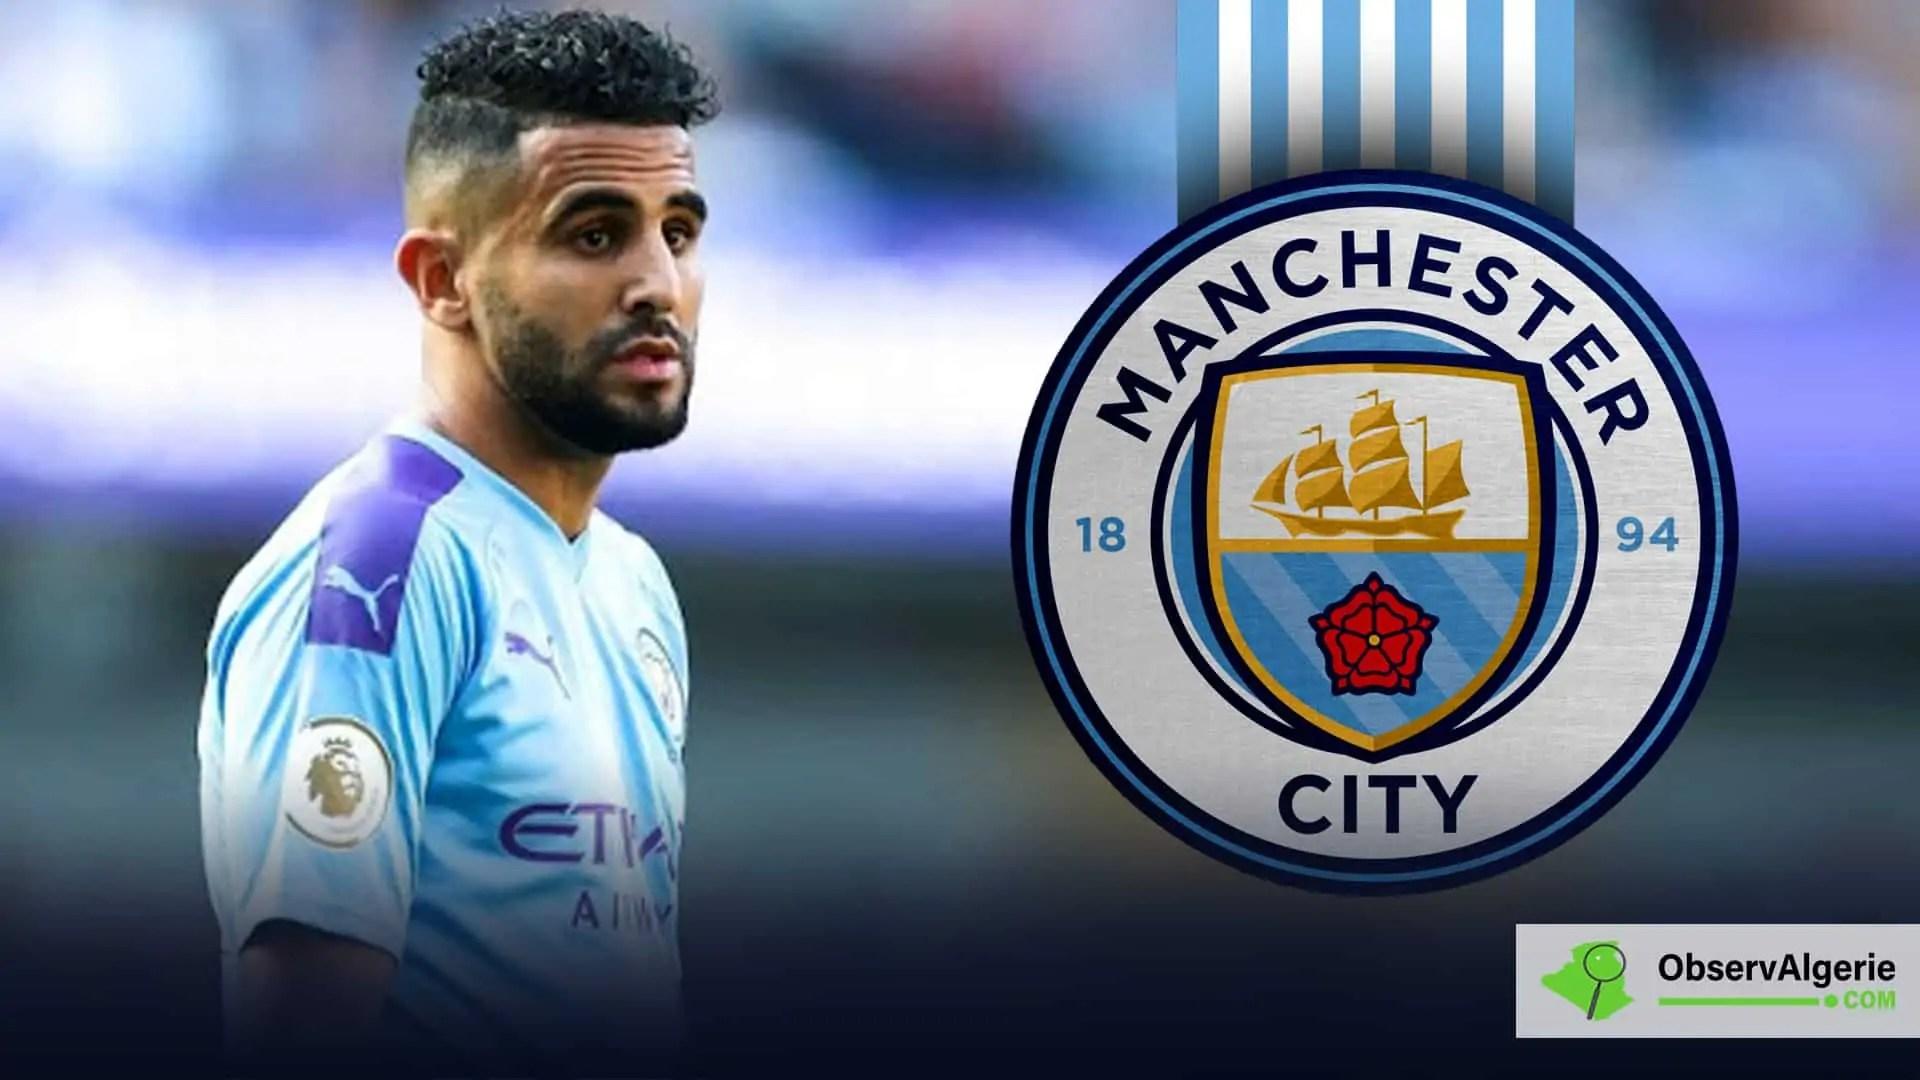 Algériens d'Europe : Quel avenir pour Riyad Mahrez à Manchester City ?